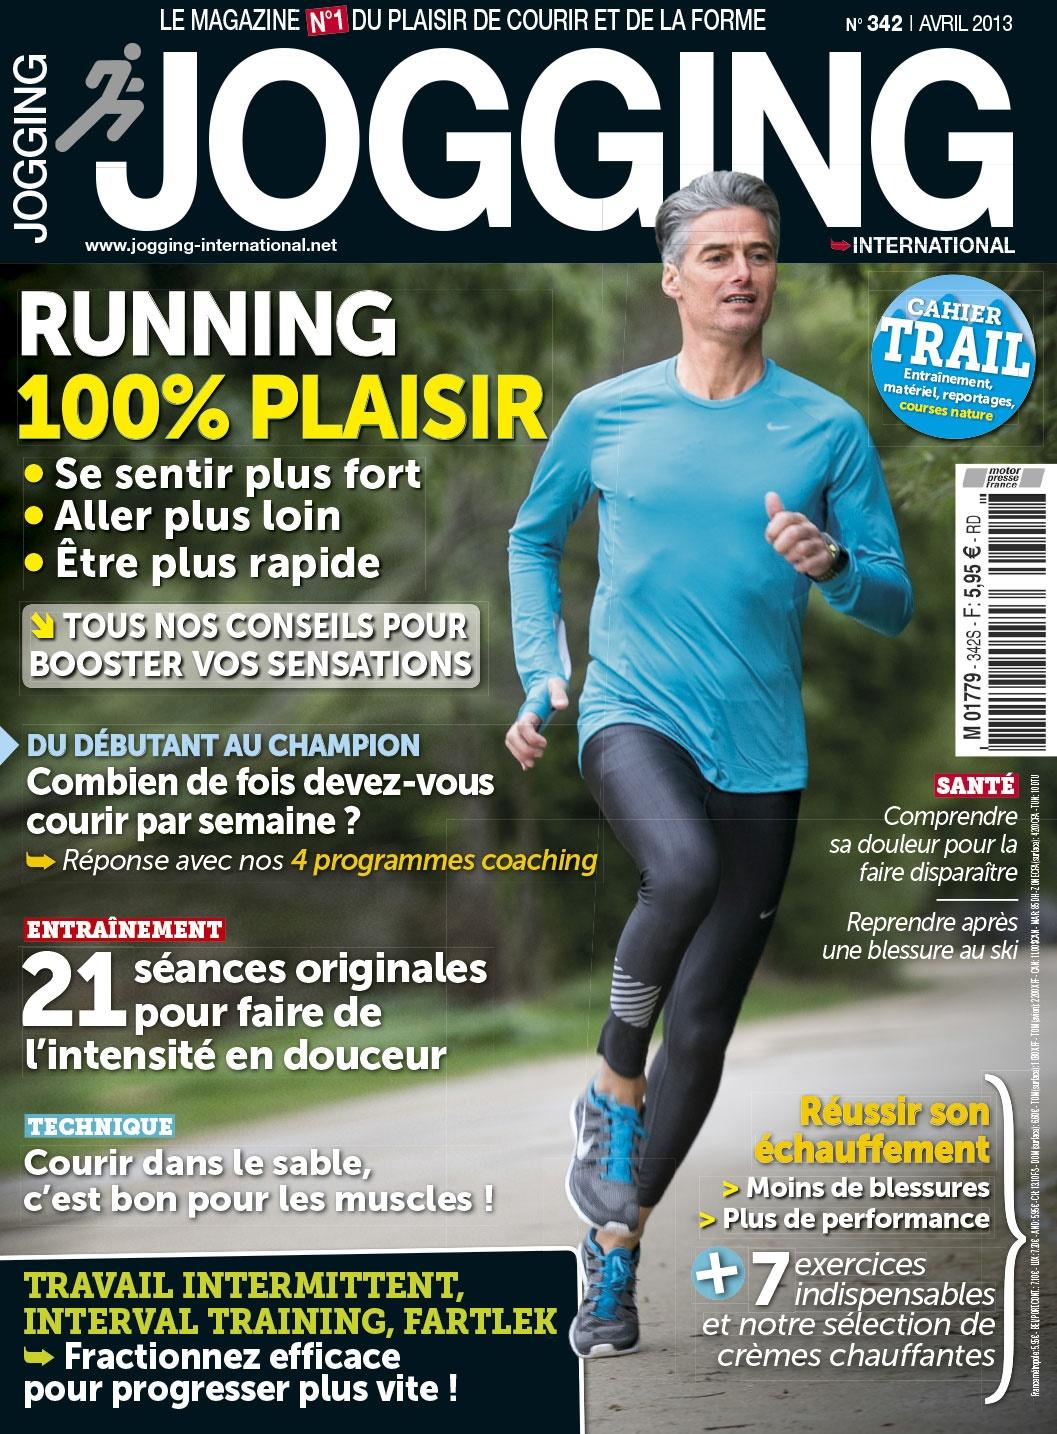 Jogging International N°342 - Running 100% Plaisir